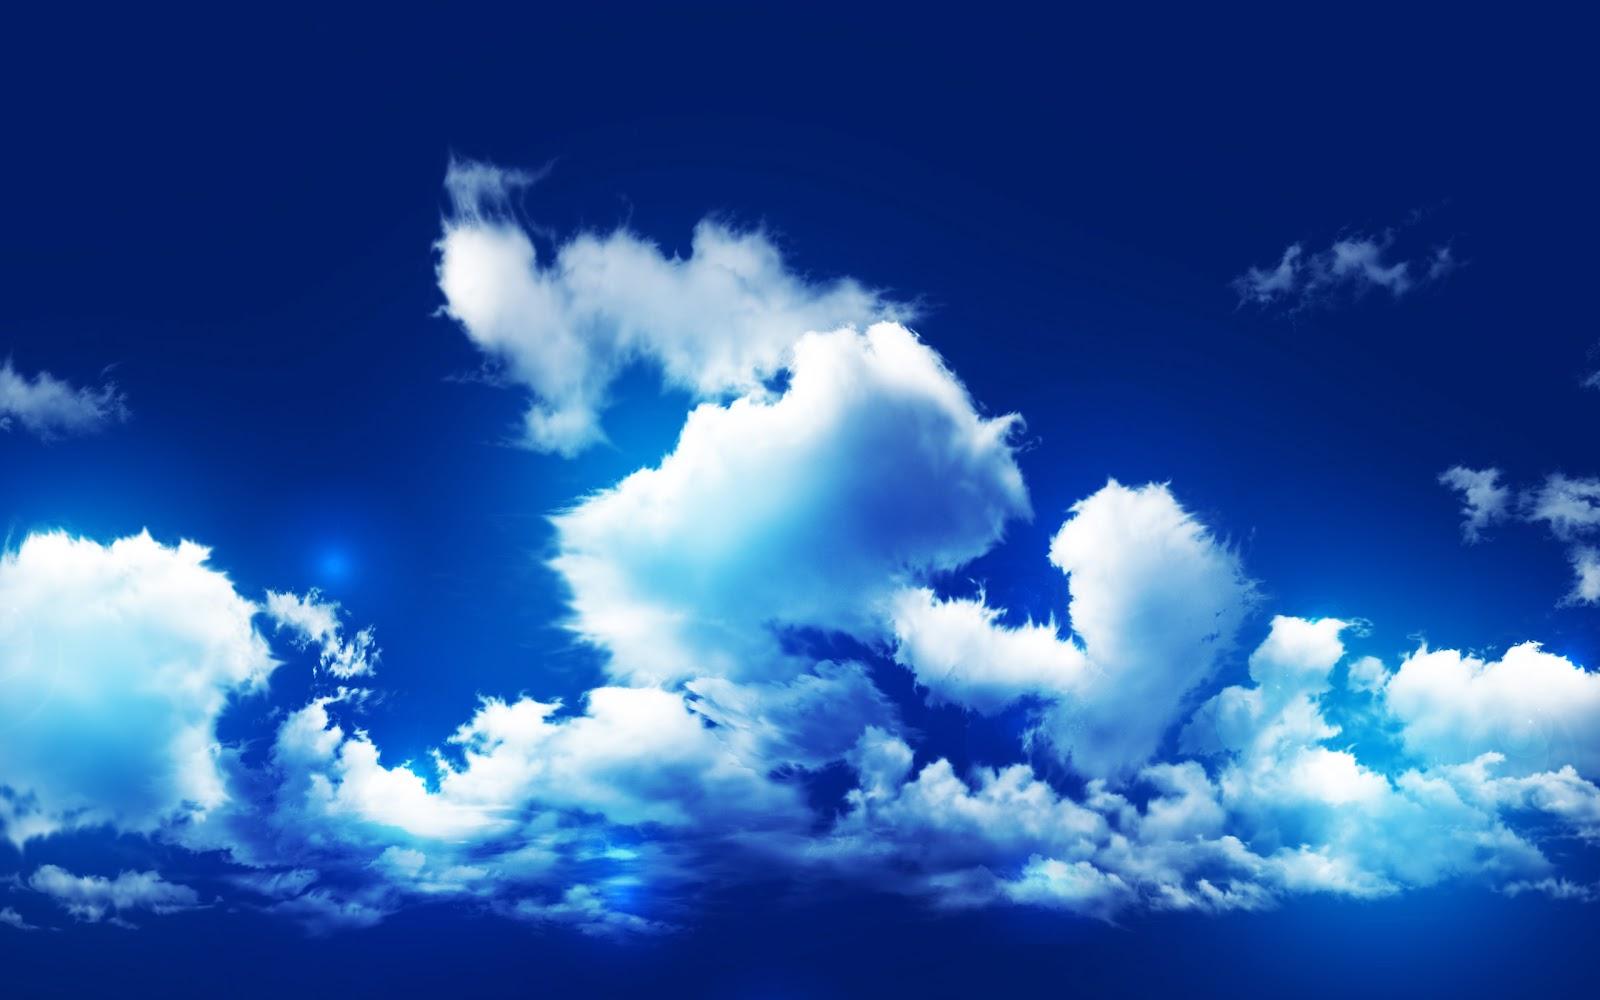 http://4.bp.blogspot.com/-ojUGo7zZg_g/TcXKnL2NDVI/AAAAAAAAHl8/hTRELEbBP0U/s1600/Cloudy+blue+sky+hd+wallpaper.jpg